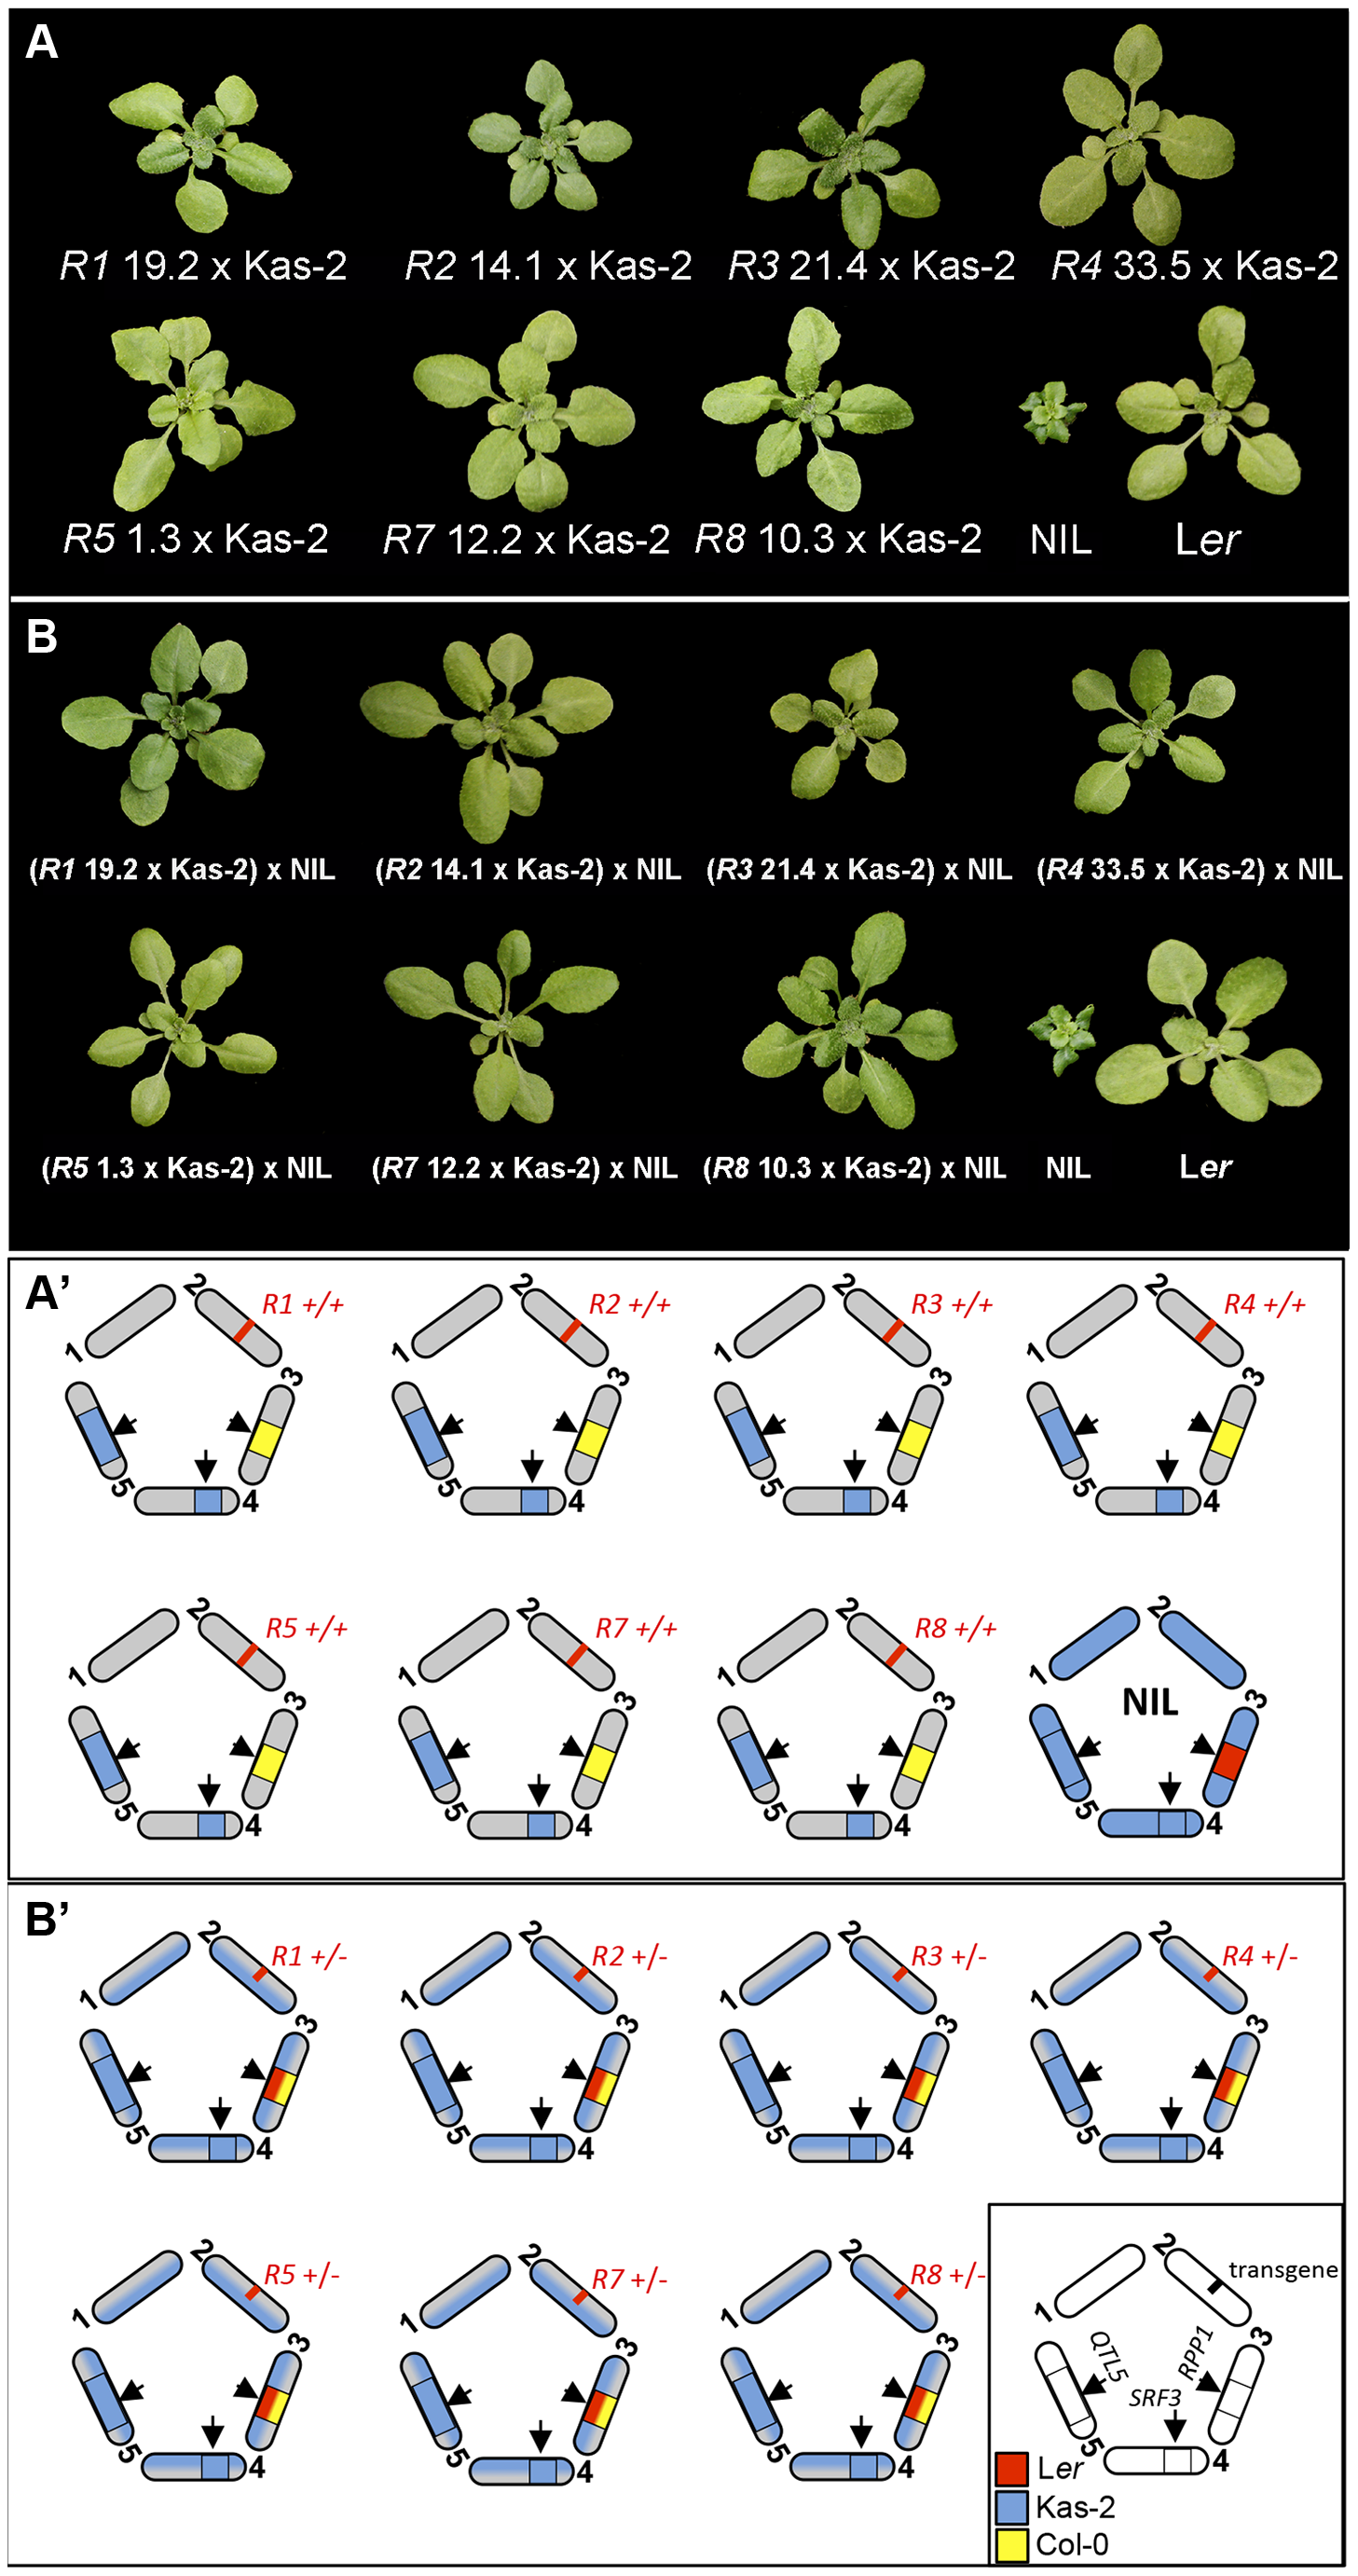 Growth phenotype at 14–16°C of Col<i><sup>RPP1</sup></i>/Kas-2 plants and <i>RPP1</i>-like L<i>er</i> hemizygous lines.